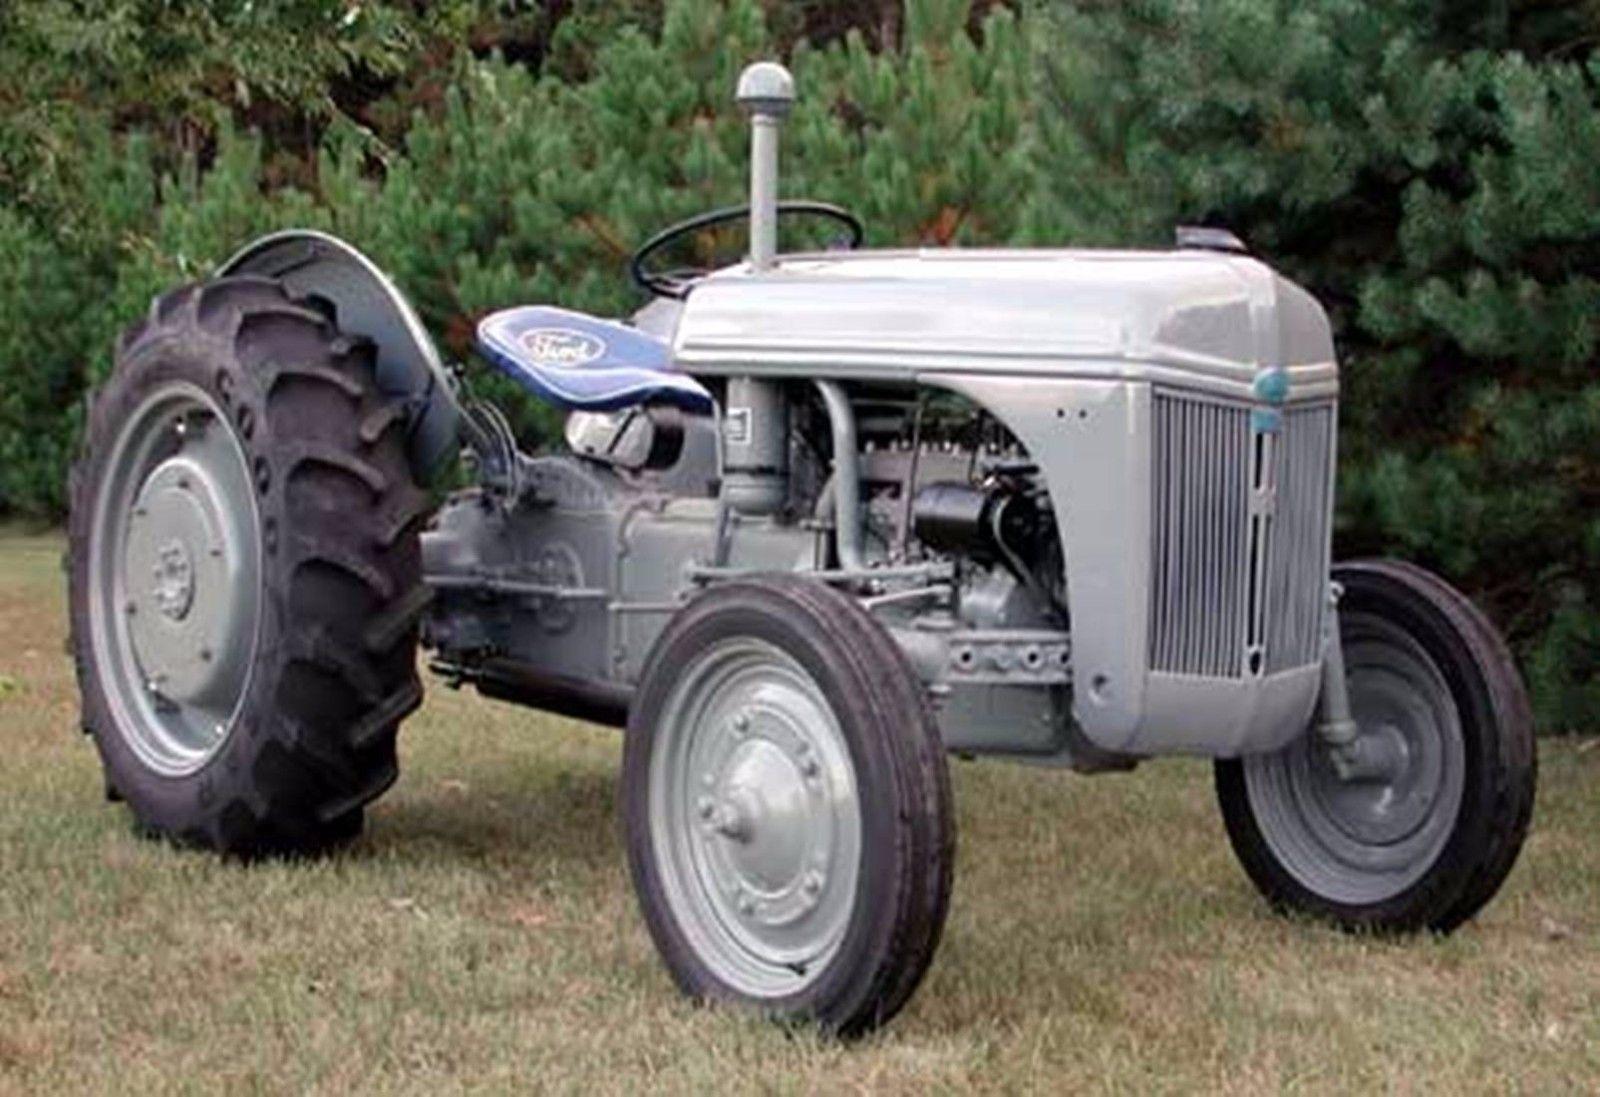 8n Manual Pdf Wiring Diagram Ford 2n 9n Tractor Workshop Parts Ebay Classic Rh Pinterest Co Uk Cubase 8